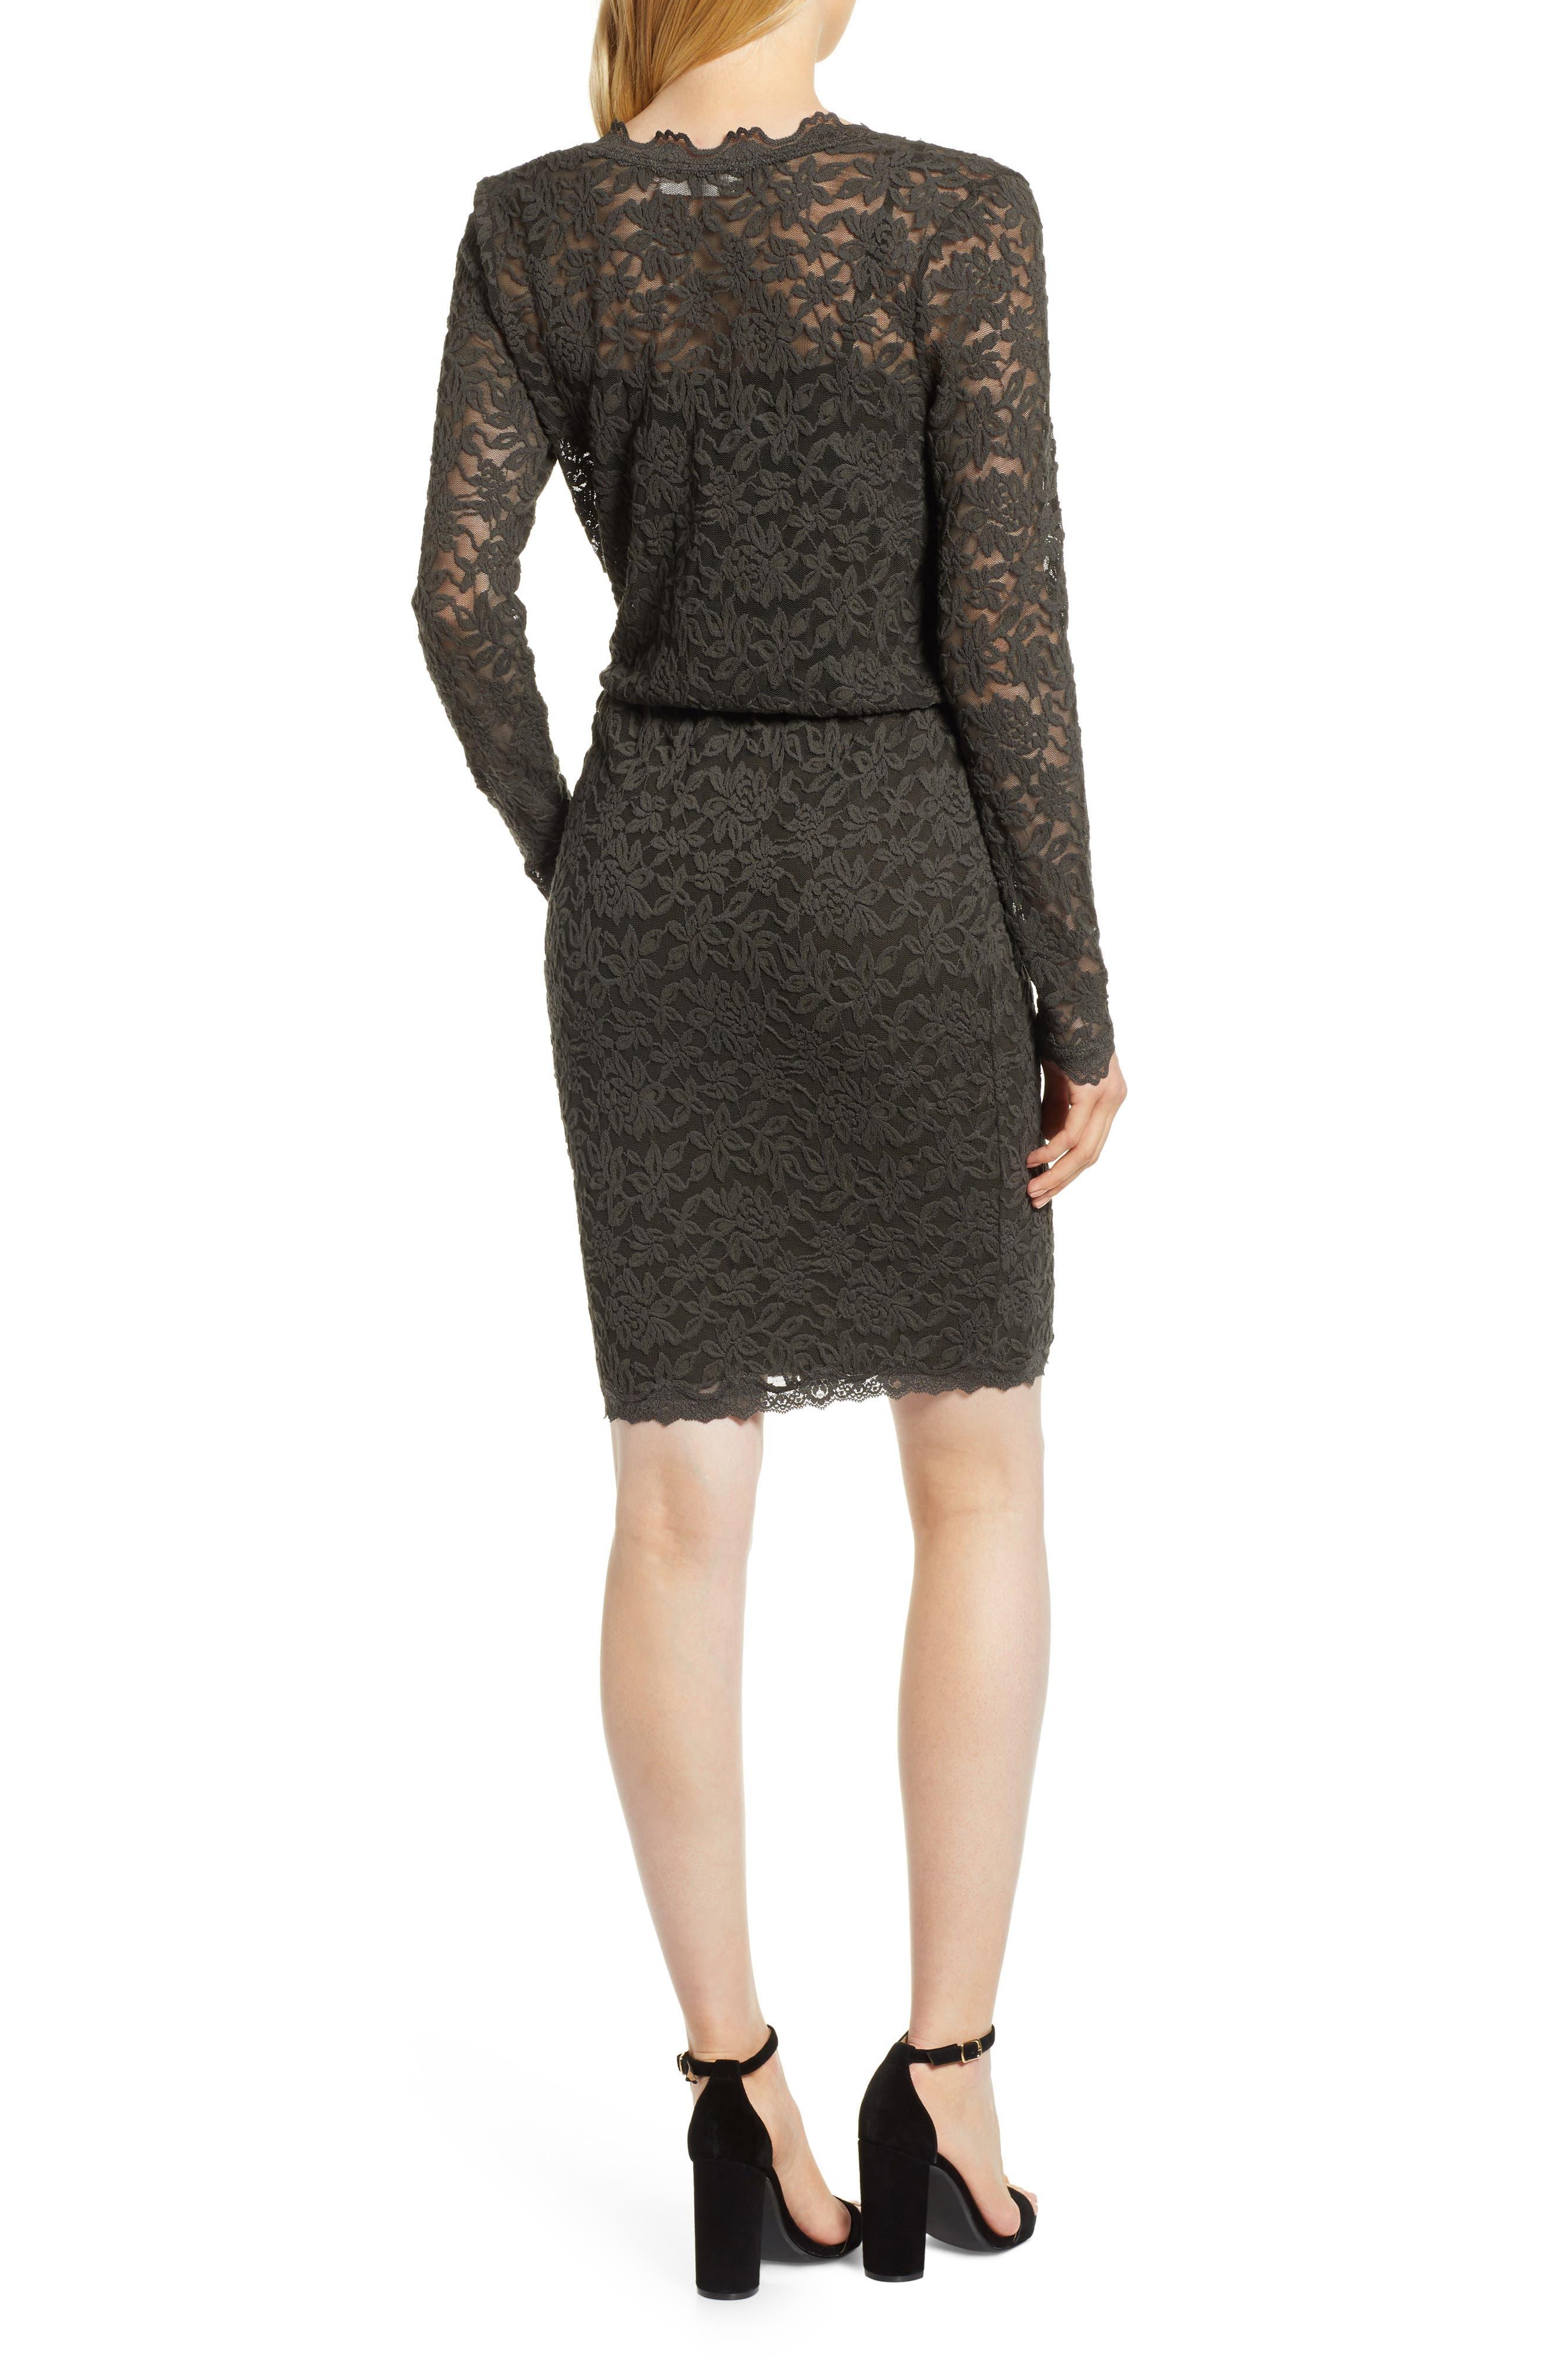 ROSEMUNDE, Delicia Scallop Detail Cotton Blend Lace Dress, Alternate thumbnail 2, color, DARK FOREST